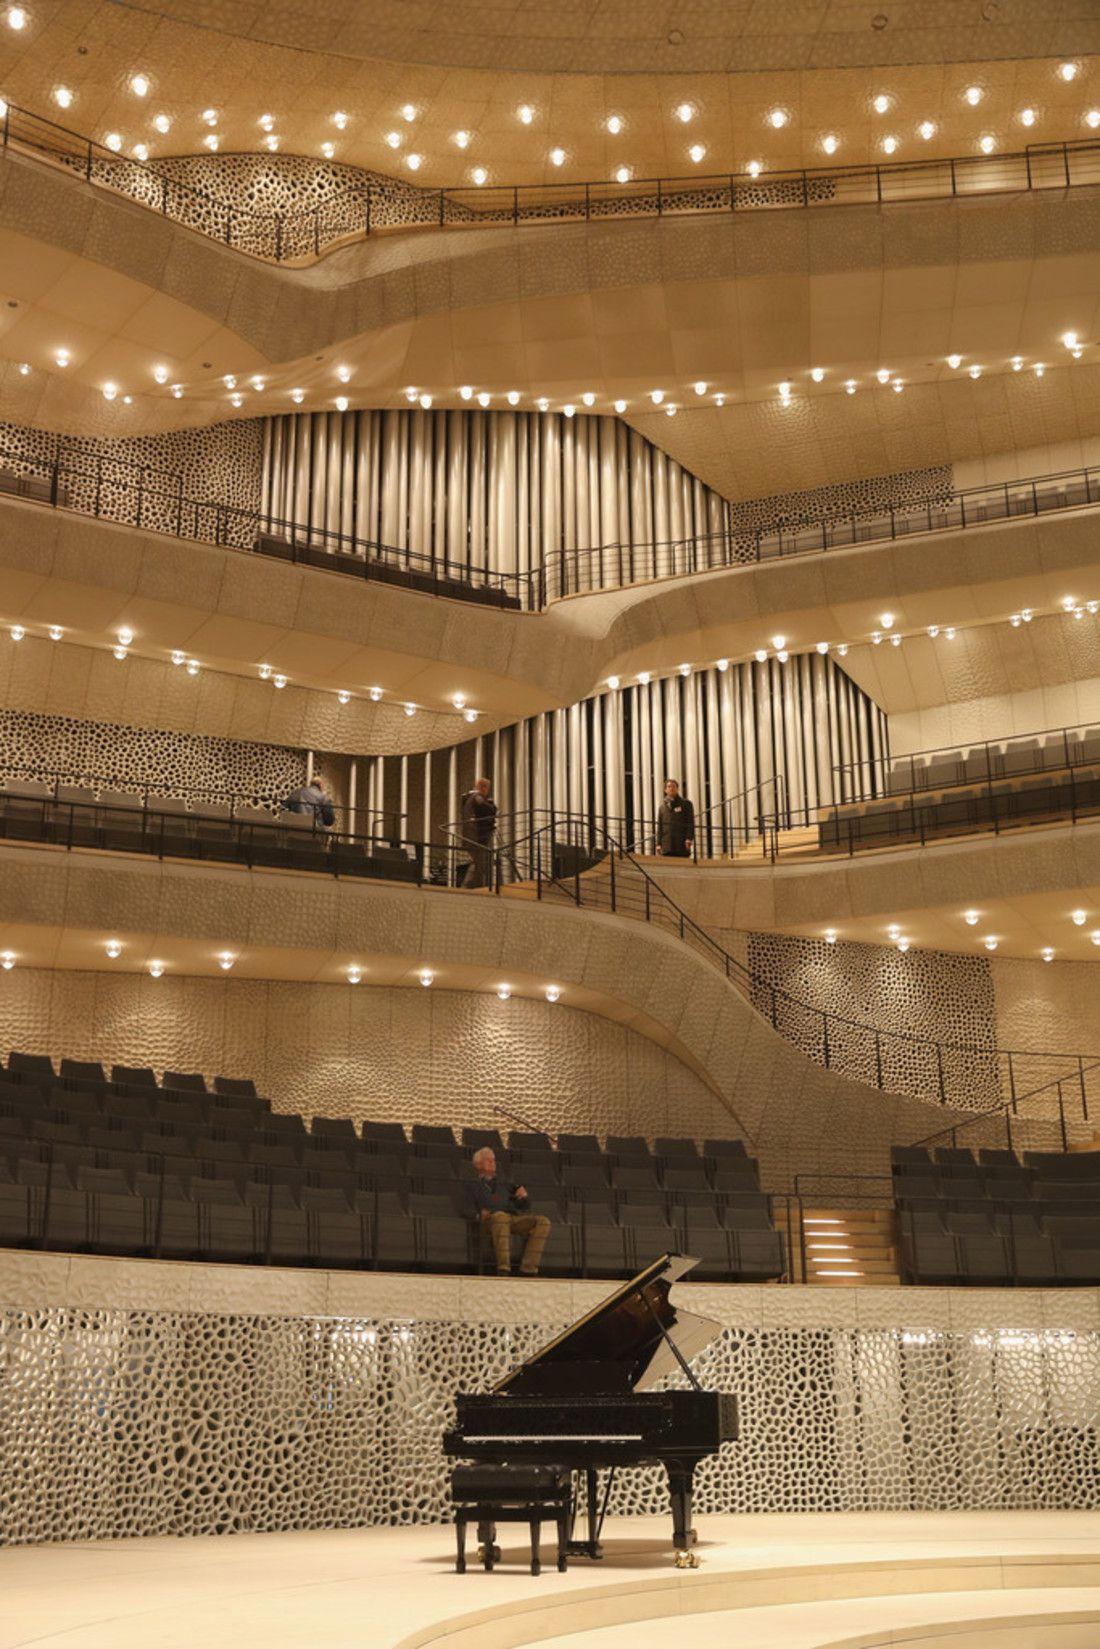 L Elbphilharmonie De Hambourg Allemagne Princess Monarchy Konzerthalle Flur Design Hamburg